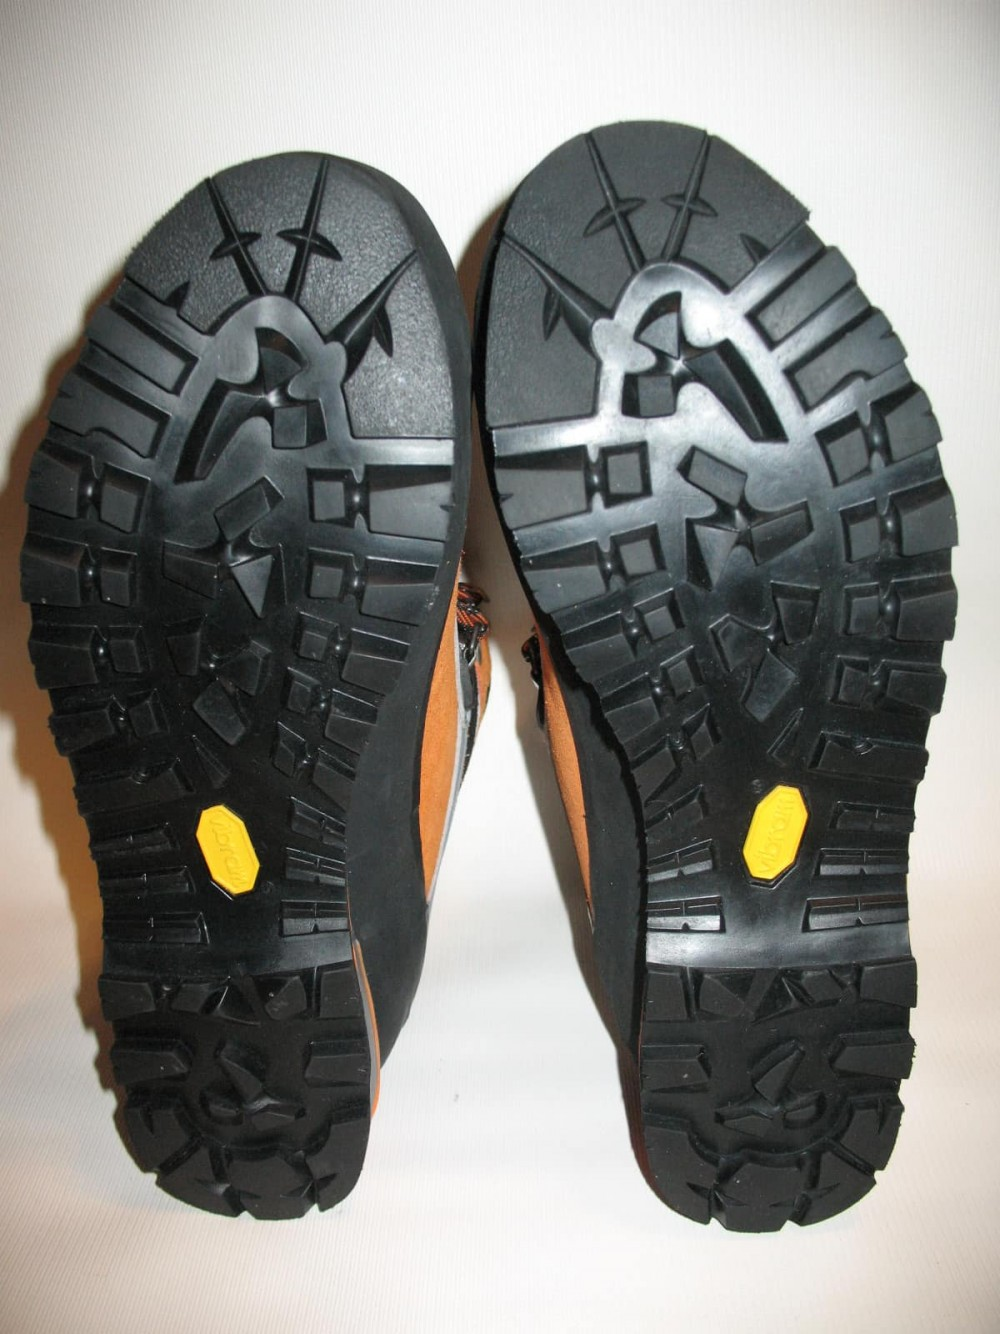 Ботинки SCARPA triolet pro GTX boots (размер UK7/US8/EU41(на стопу 255 mm)) - 7